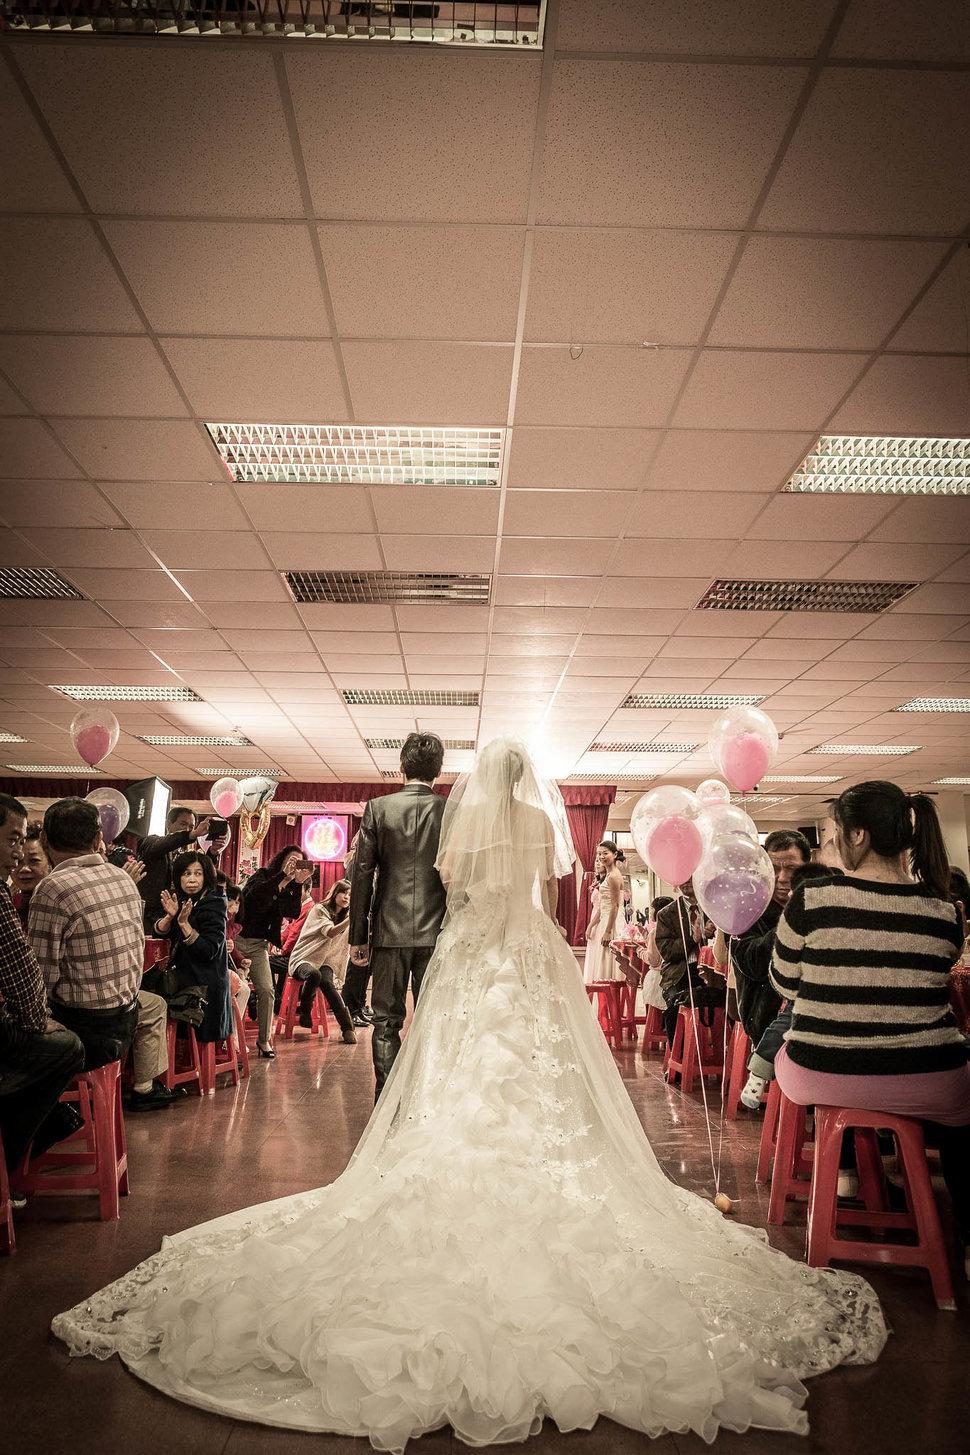 18PHOTO-振華❤️ 資婷(編號:221231) - 18PHOTO 婚紗影像攝影工作室 - 結婚吧一站式婚禮服務平台